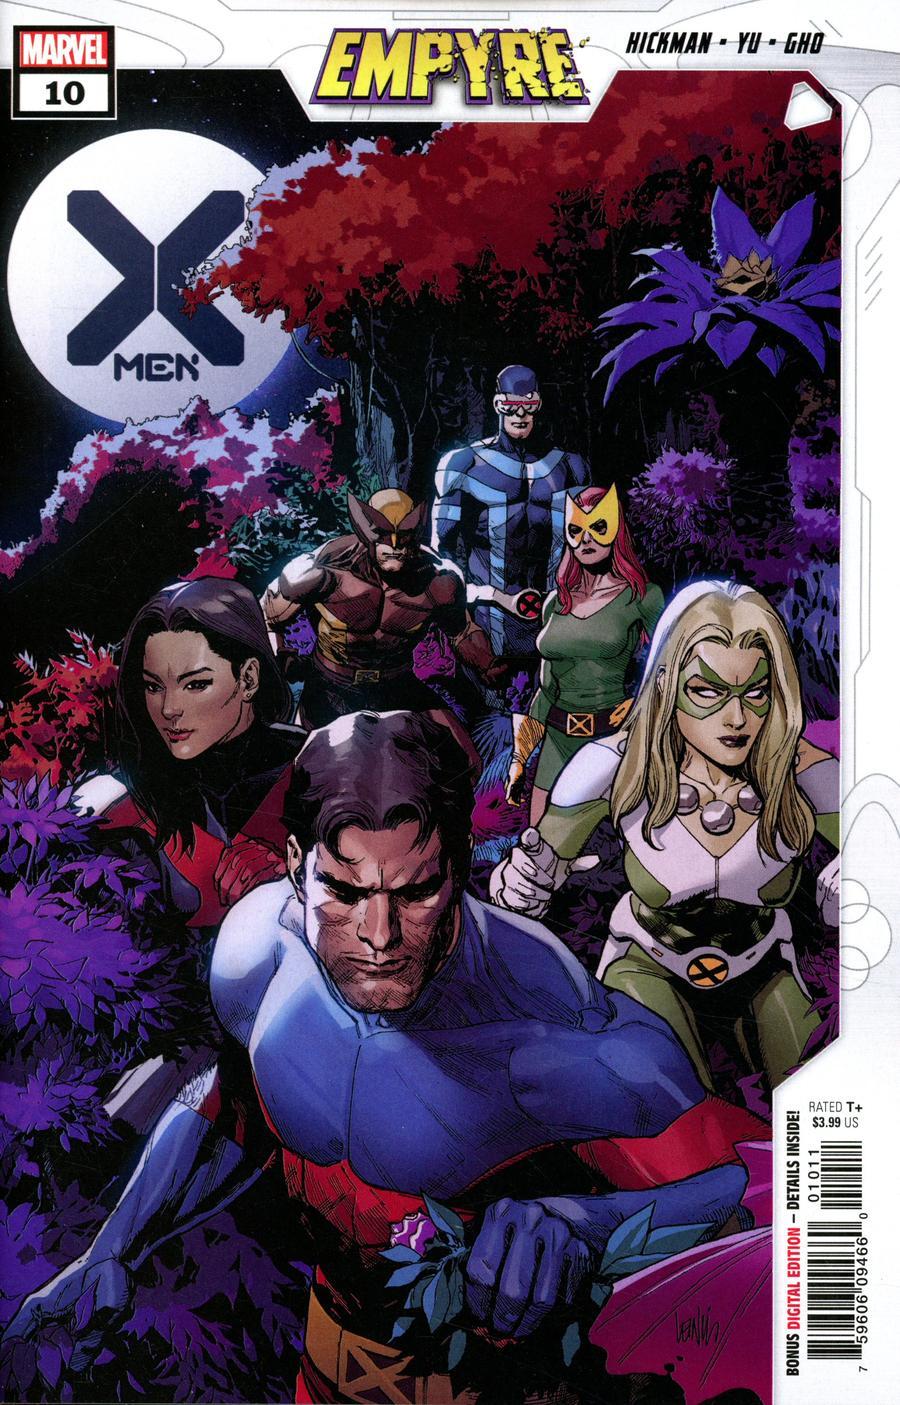 X-Men Vol 5 #10 Cover A Regular Leinil Francis Yu Cover (Empyre Tie-In)